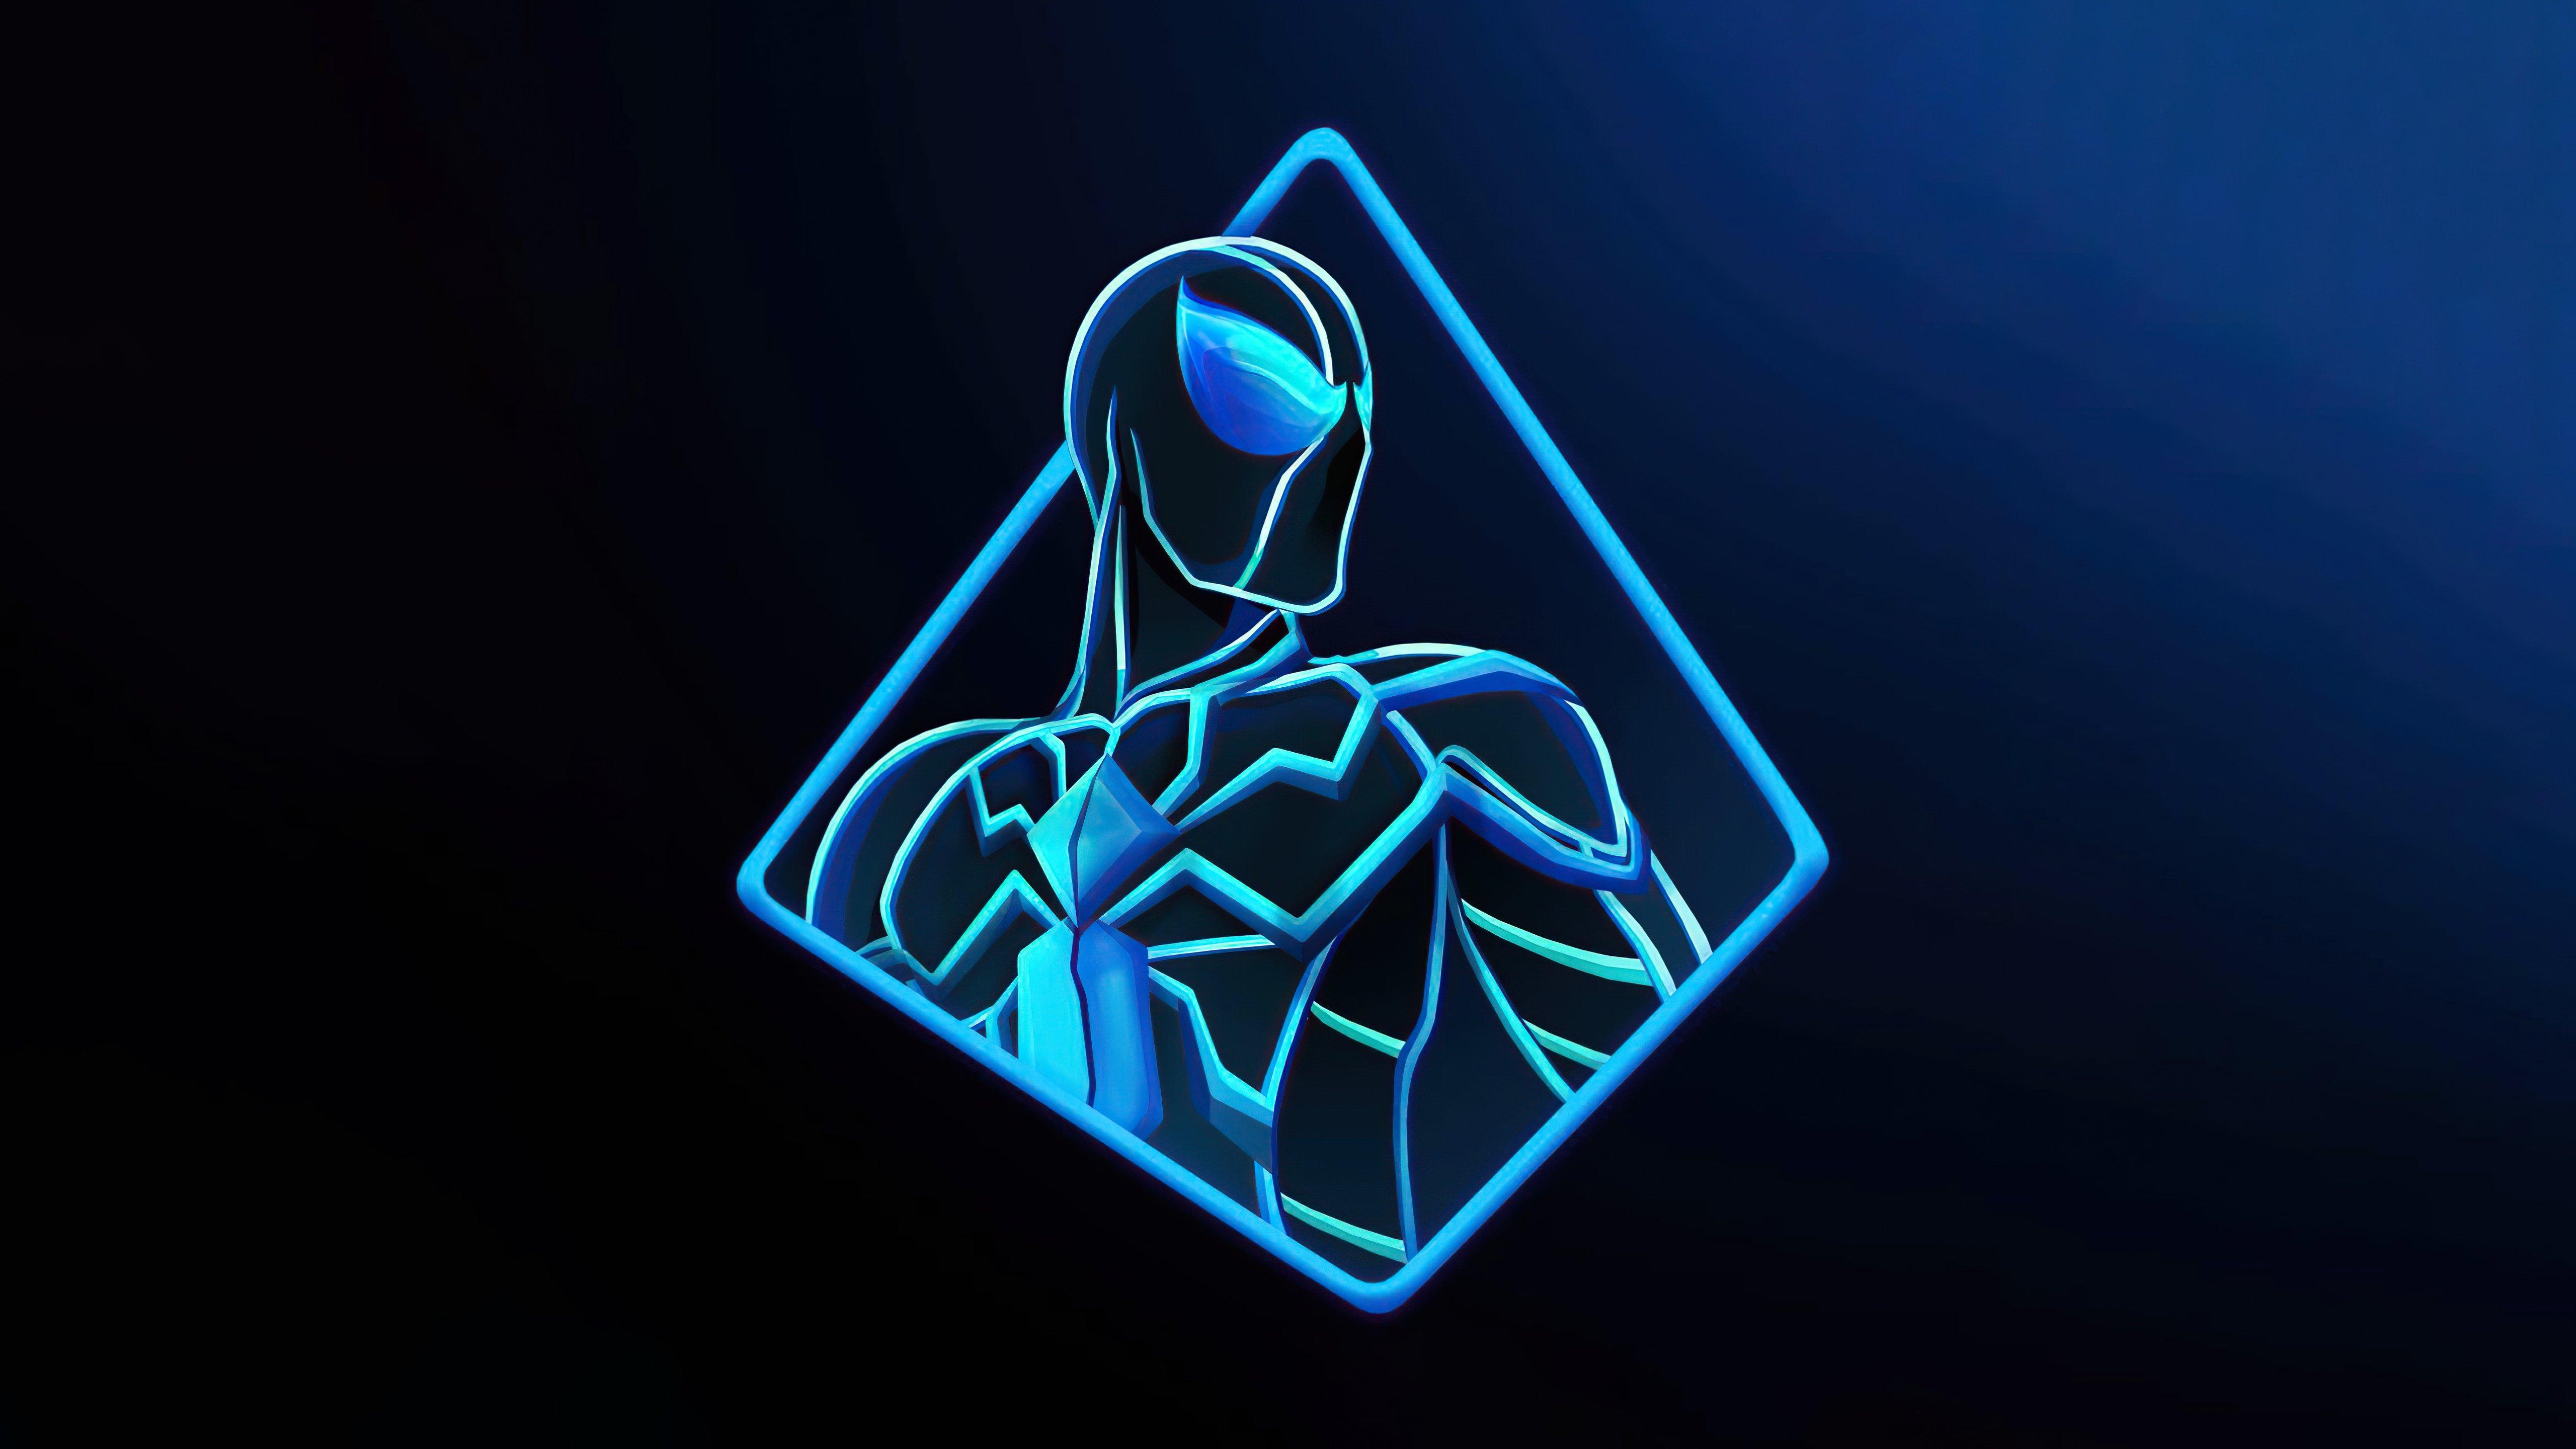 Wallpaper Spider Man Future Foundation Suit